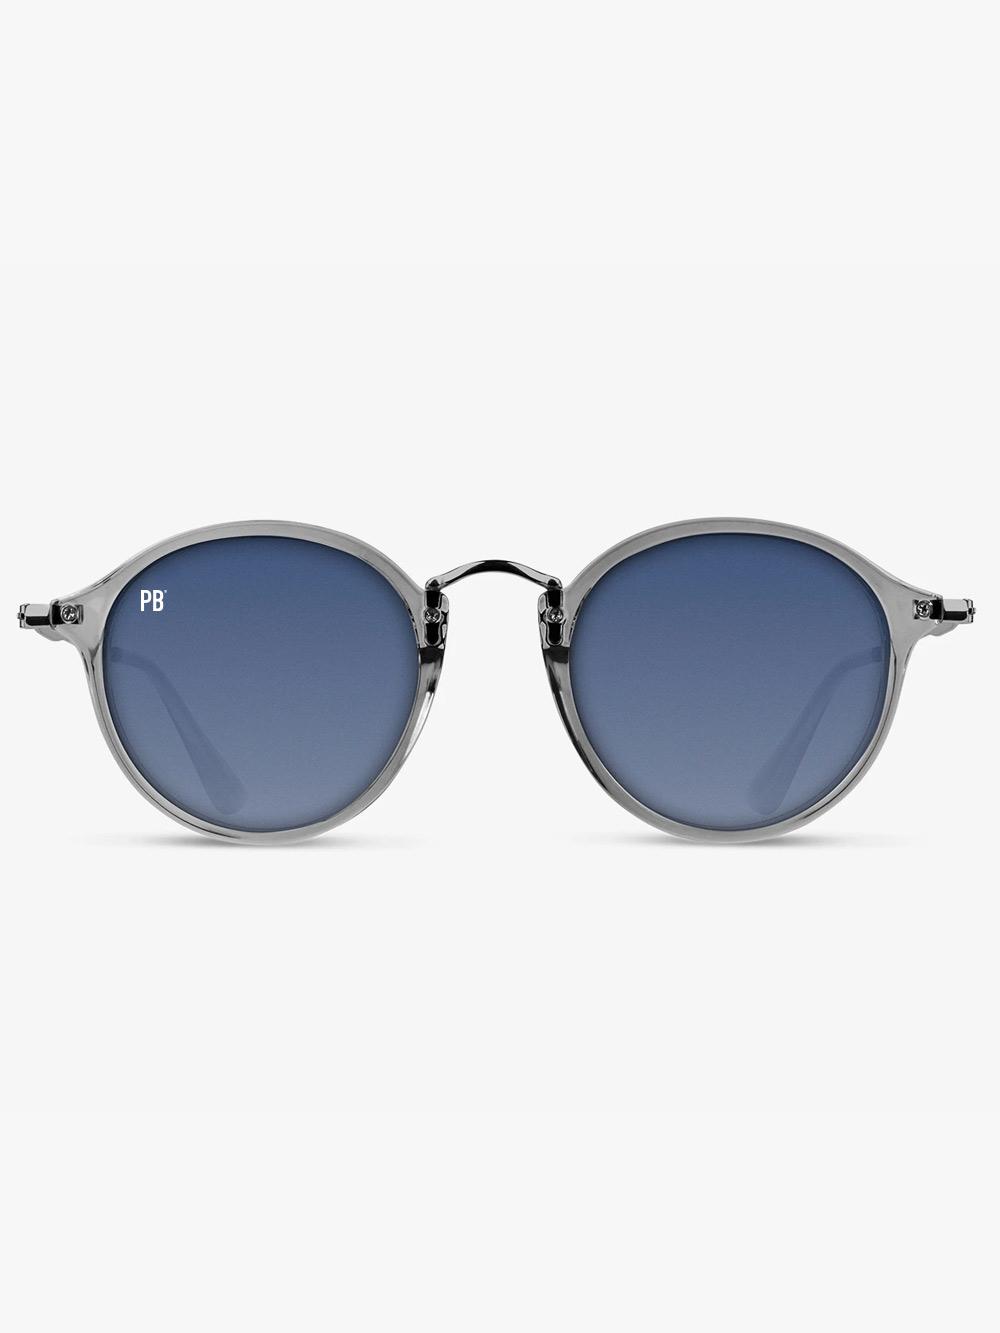 brooklyn-zonnebril-trans-grey-pbsunglasses-2